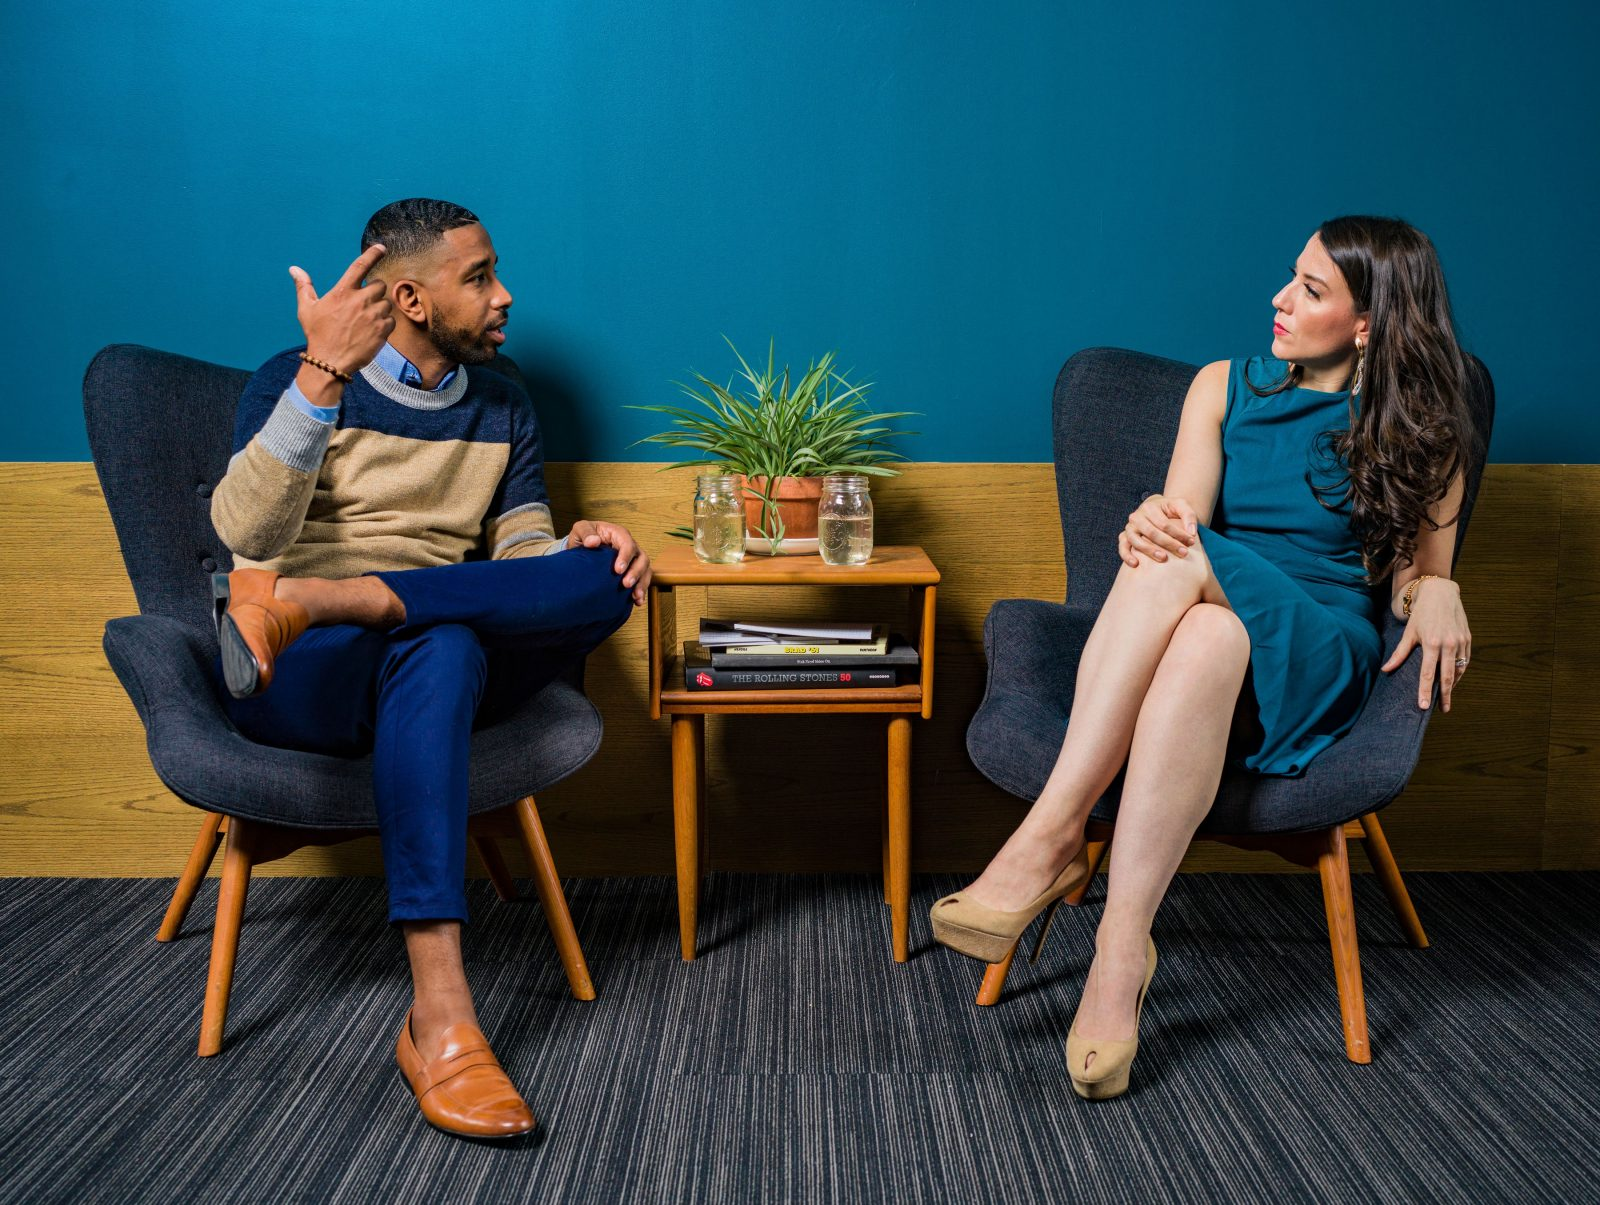 coachingsgesprek 2 mensen in gesprek